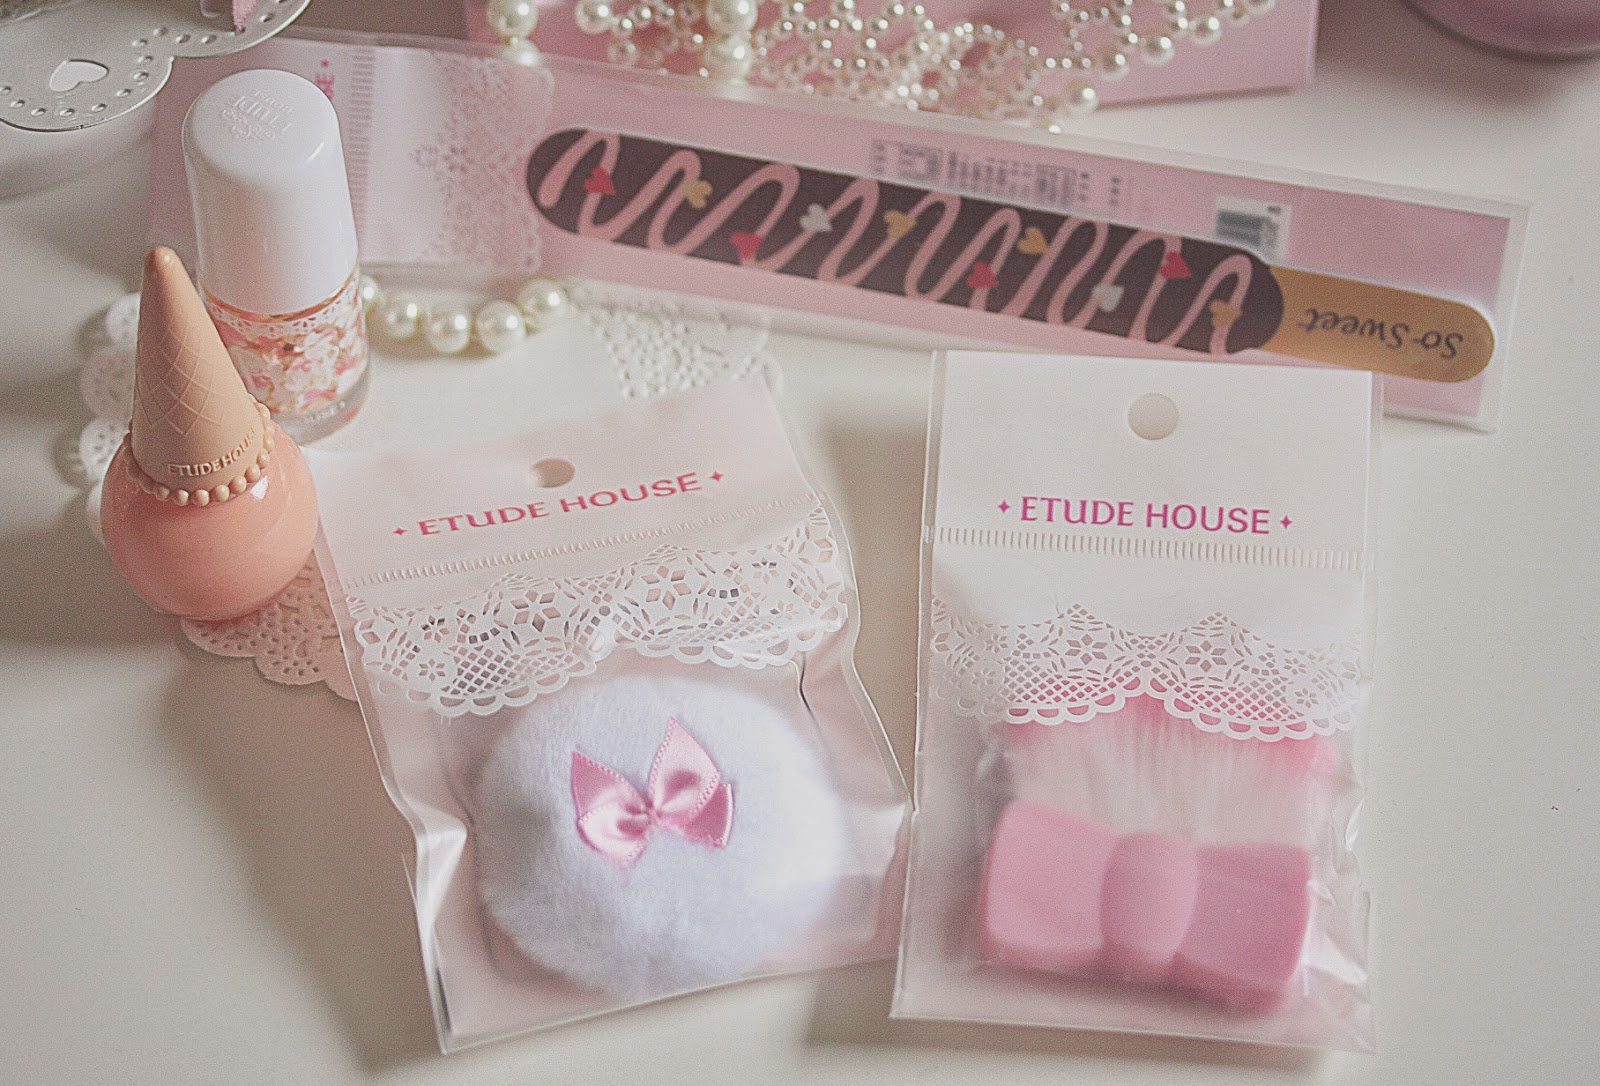 http://rosemademoiselle.blogspot.com/2014/11/kollectionk-haul.html